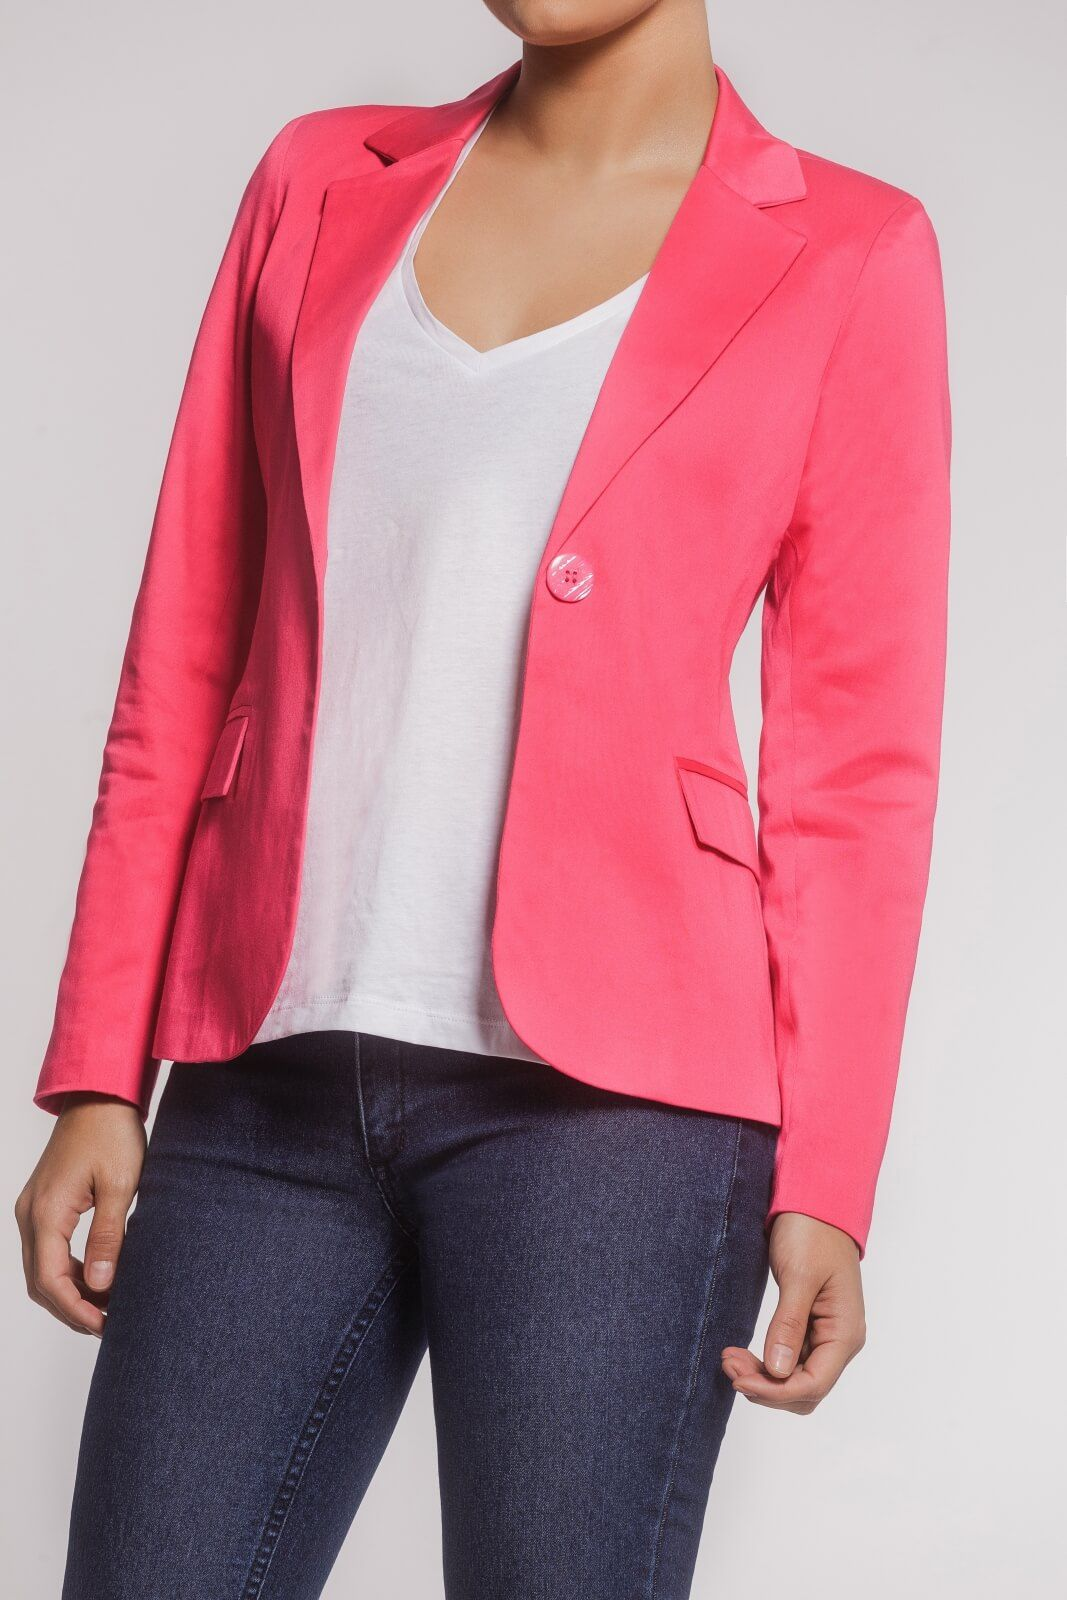 Blazer Feminino Alfaiataria Clássico Sarja Rosa Pink